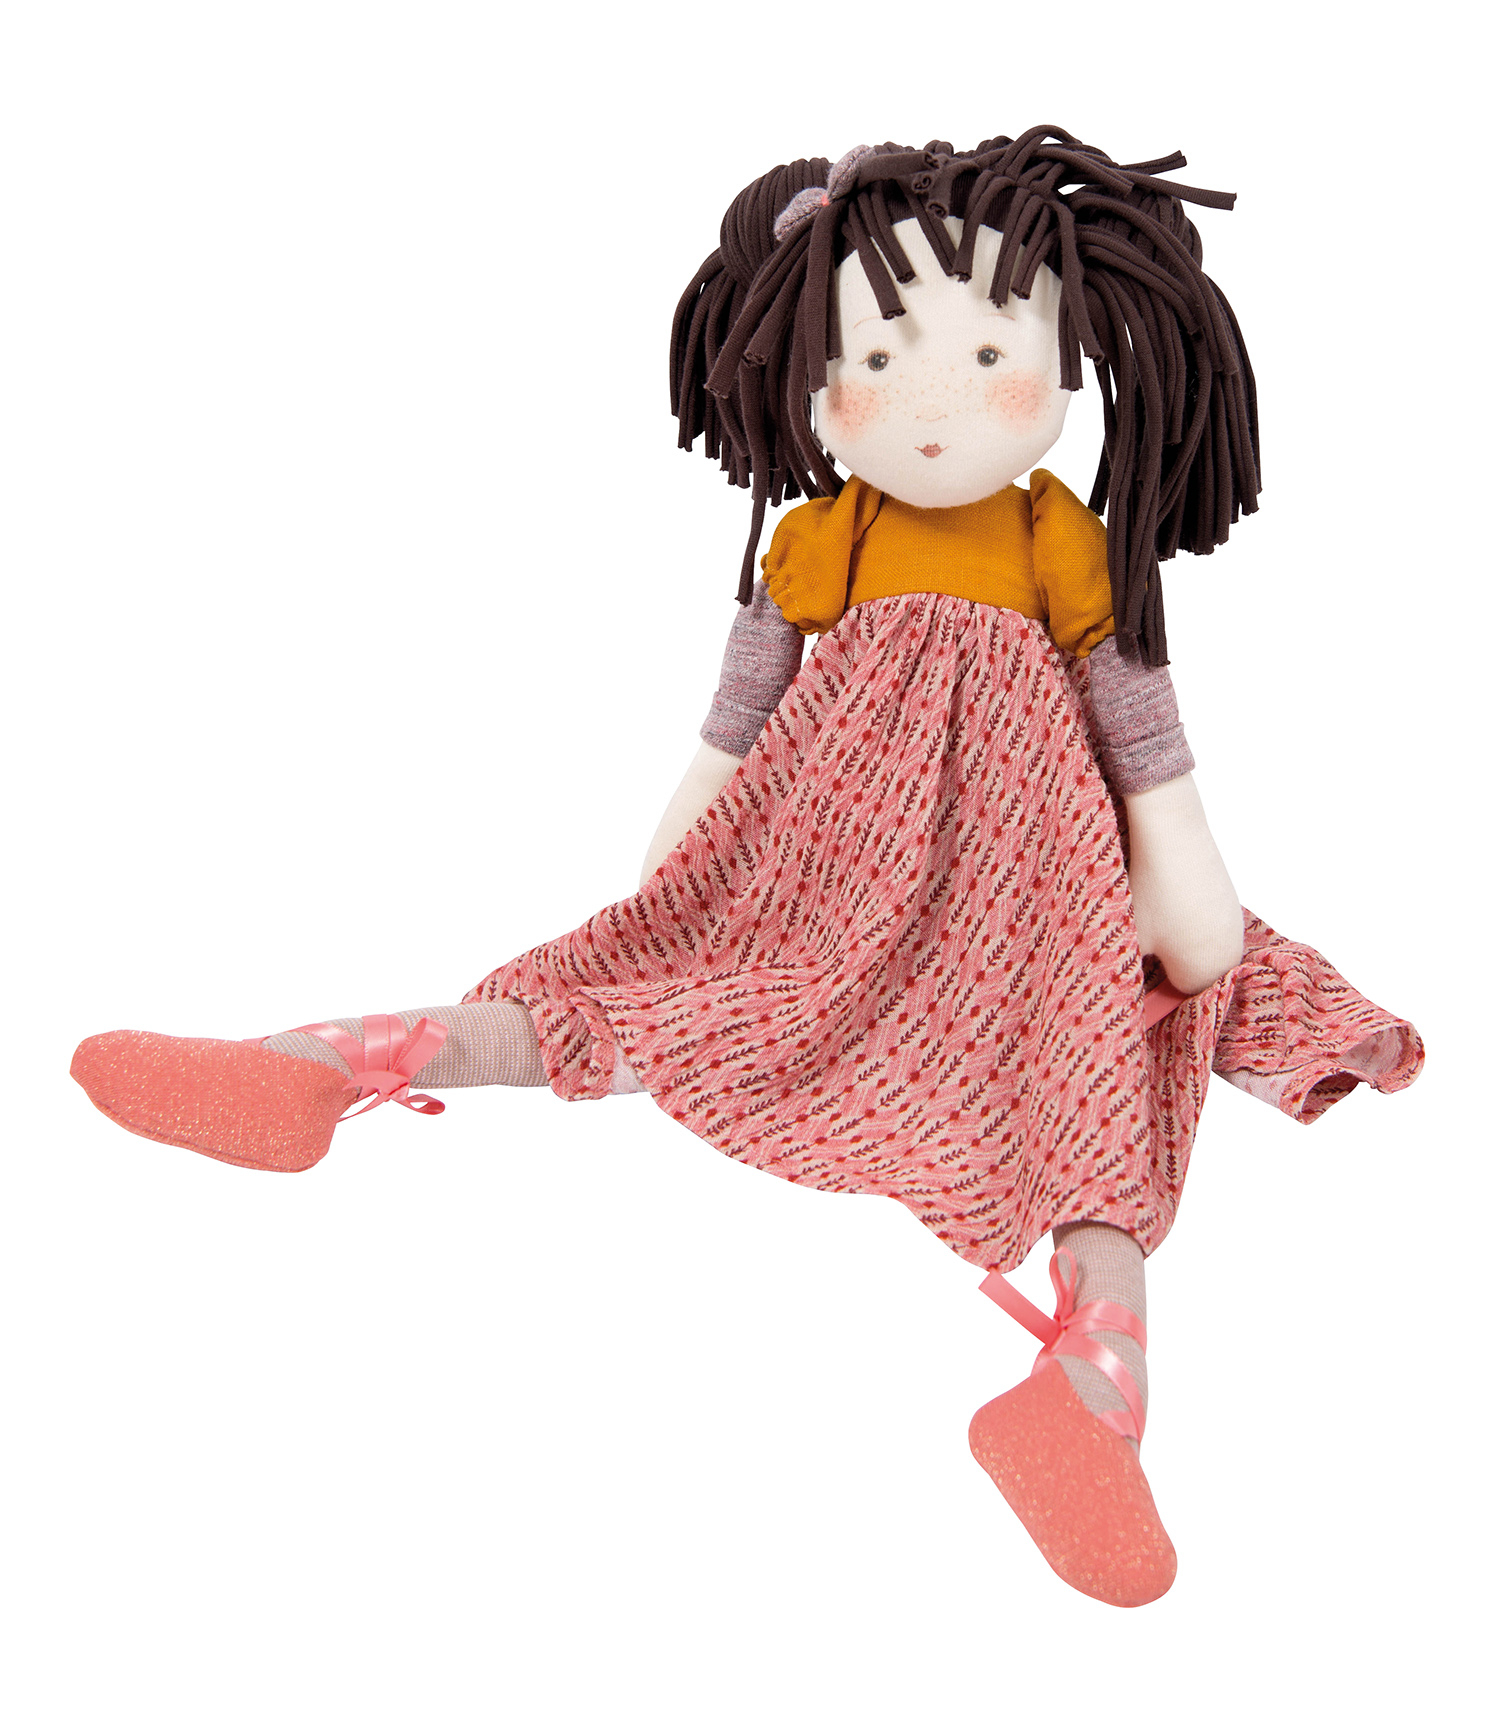 Bambola Rosalie Moulin Roty